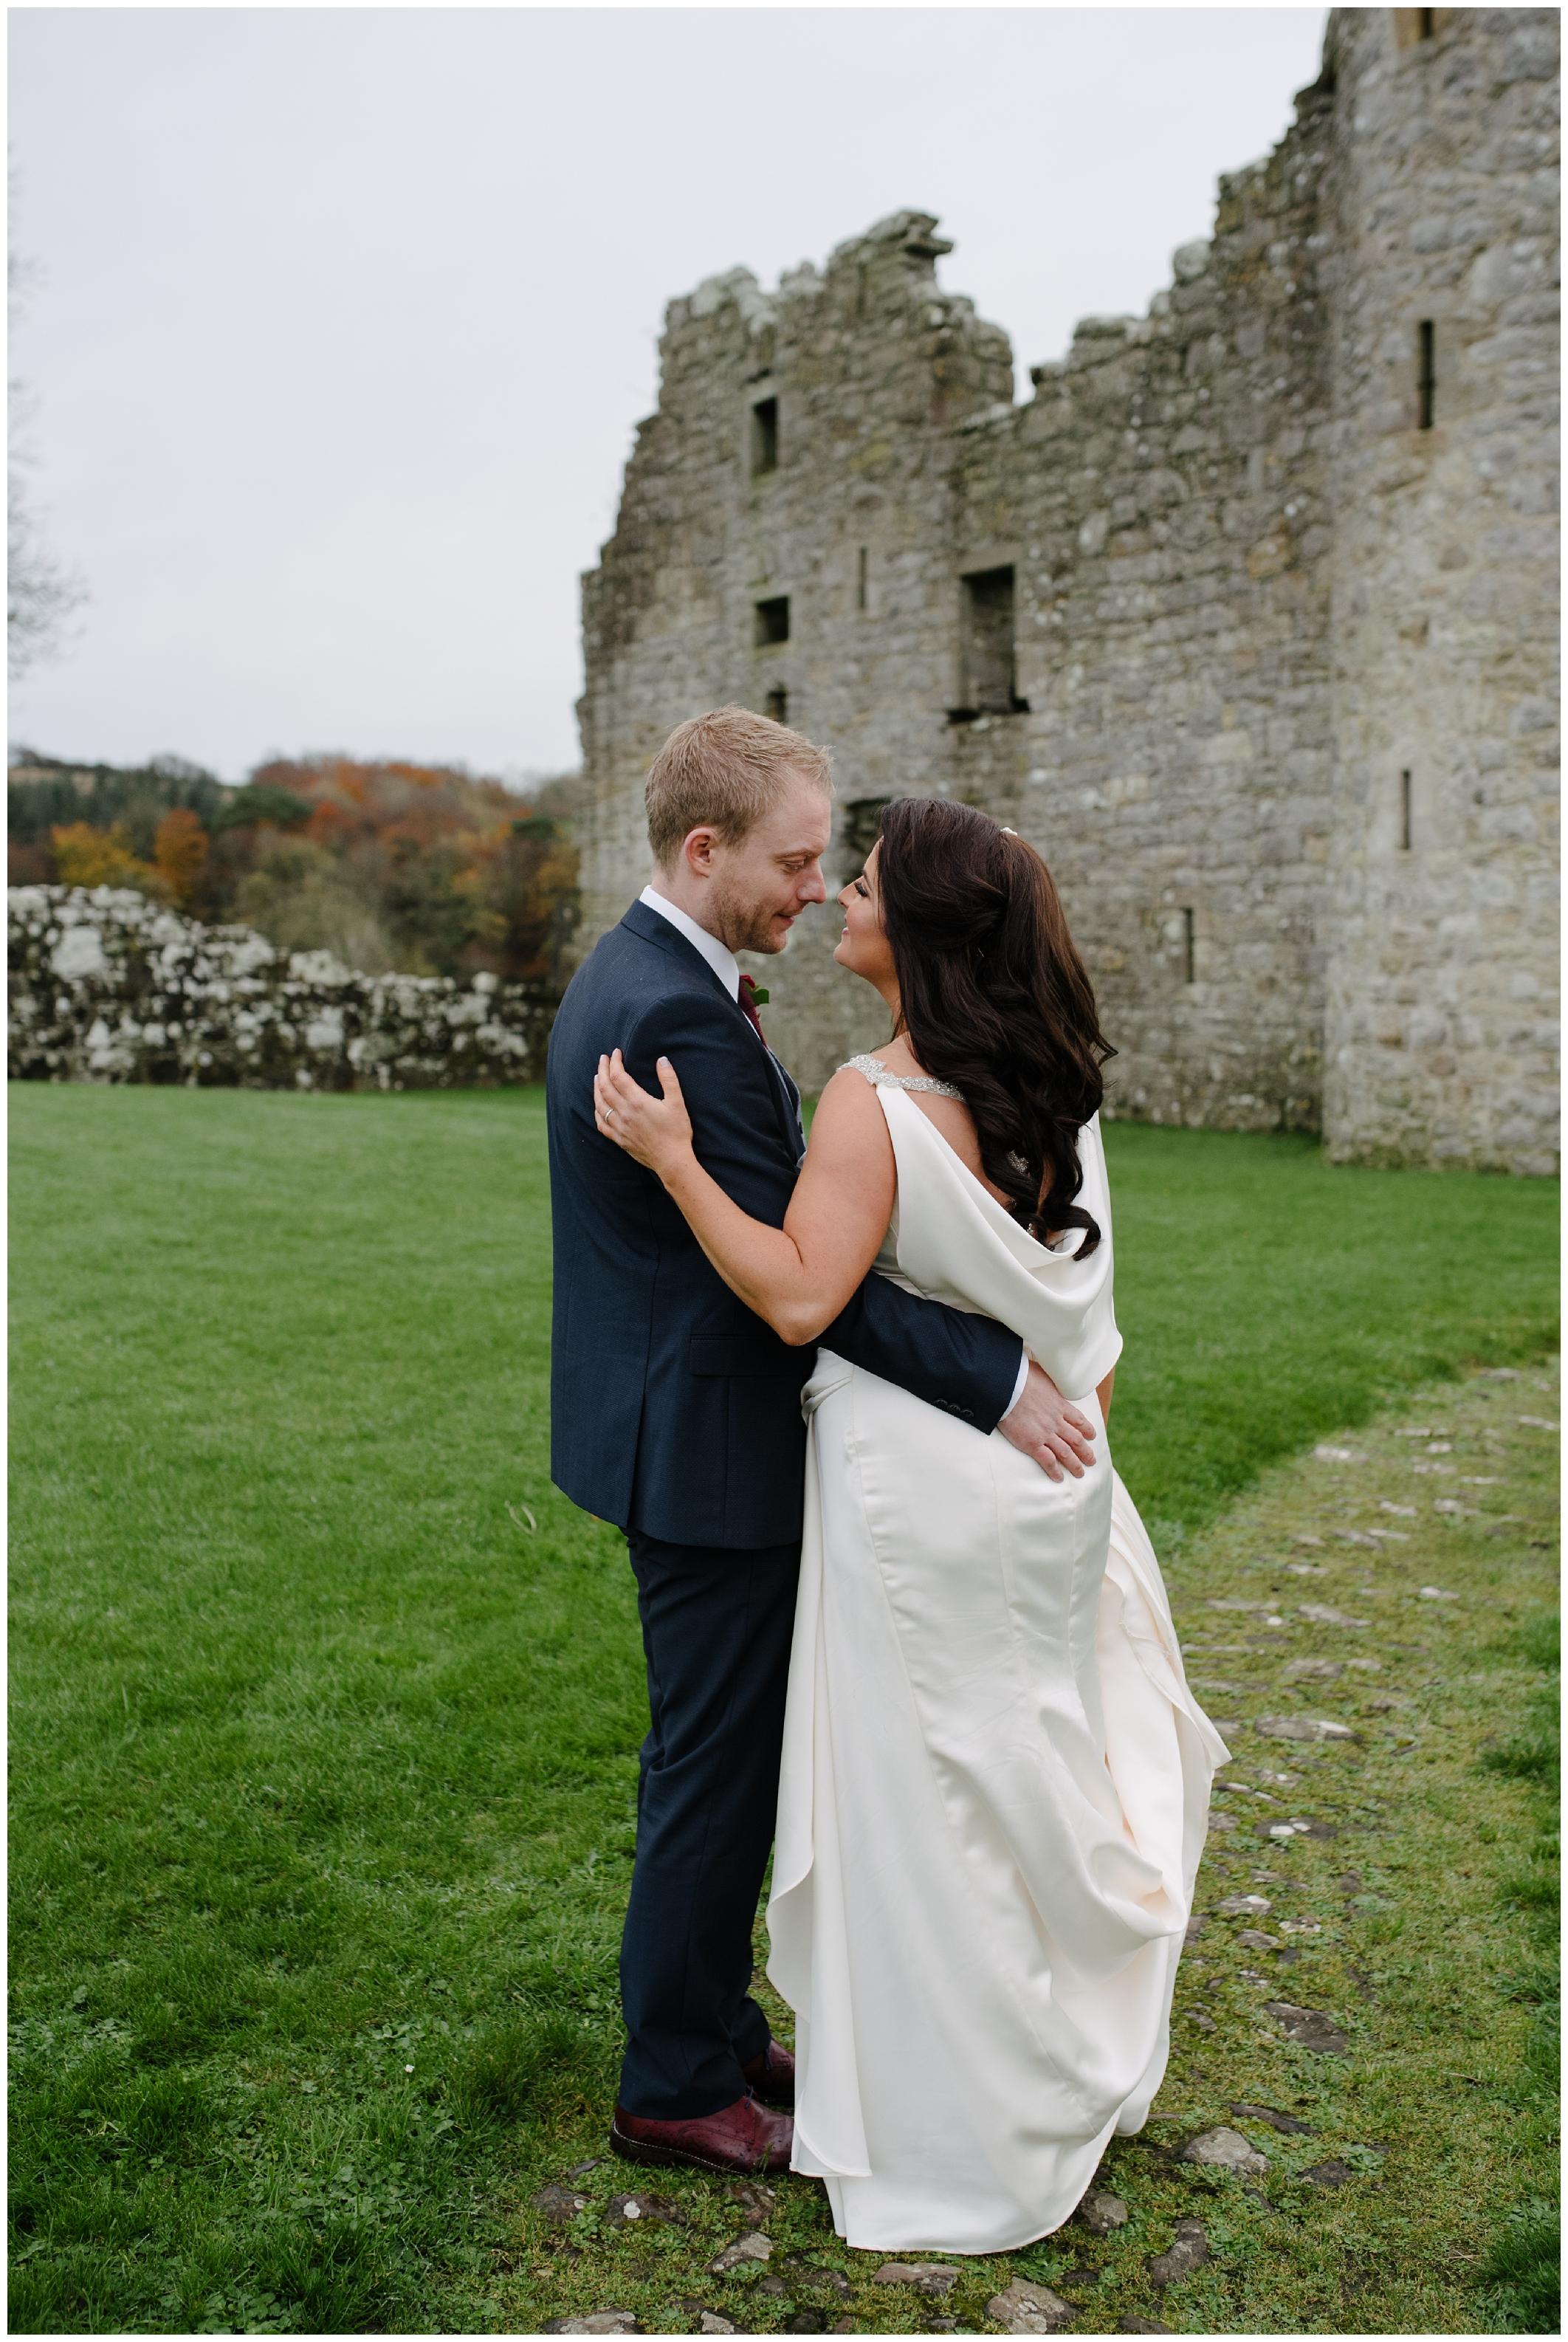 tracey_conor__wedding_jude_browne_photography_0047.jpg